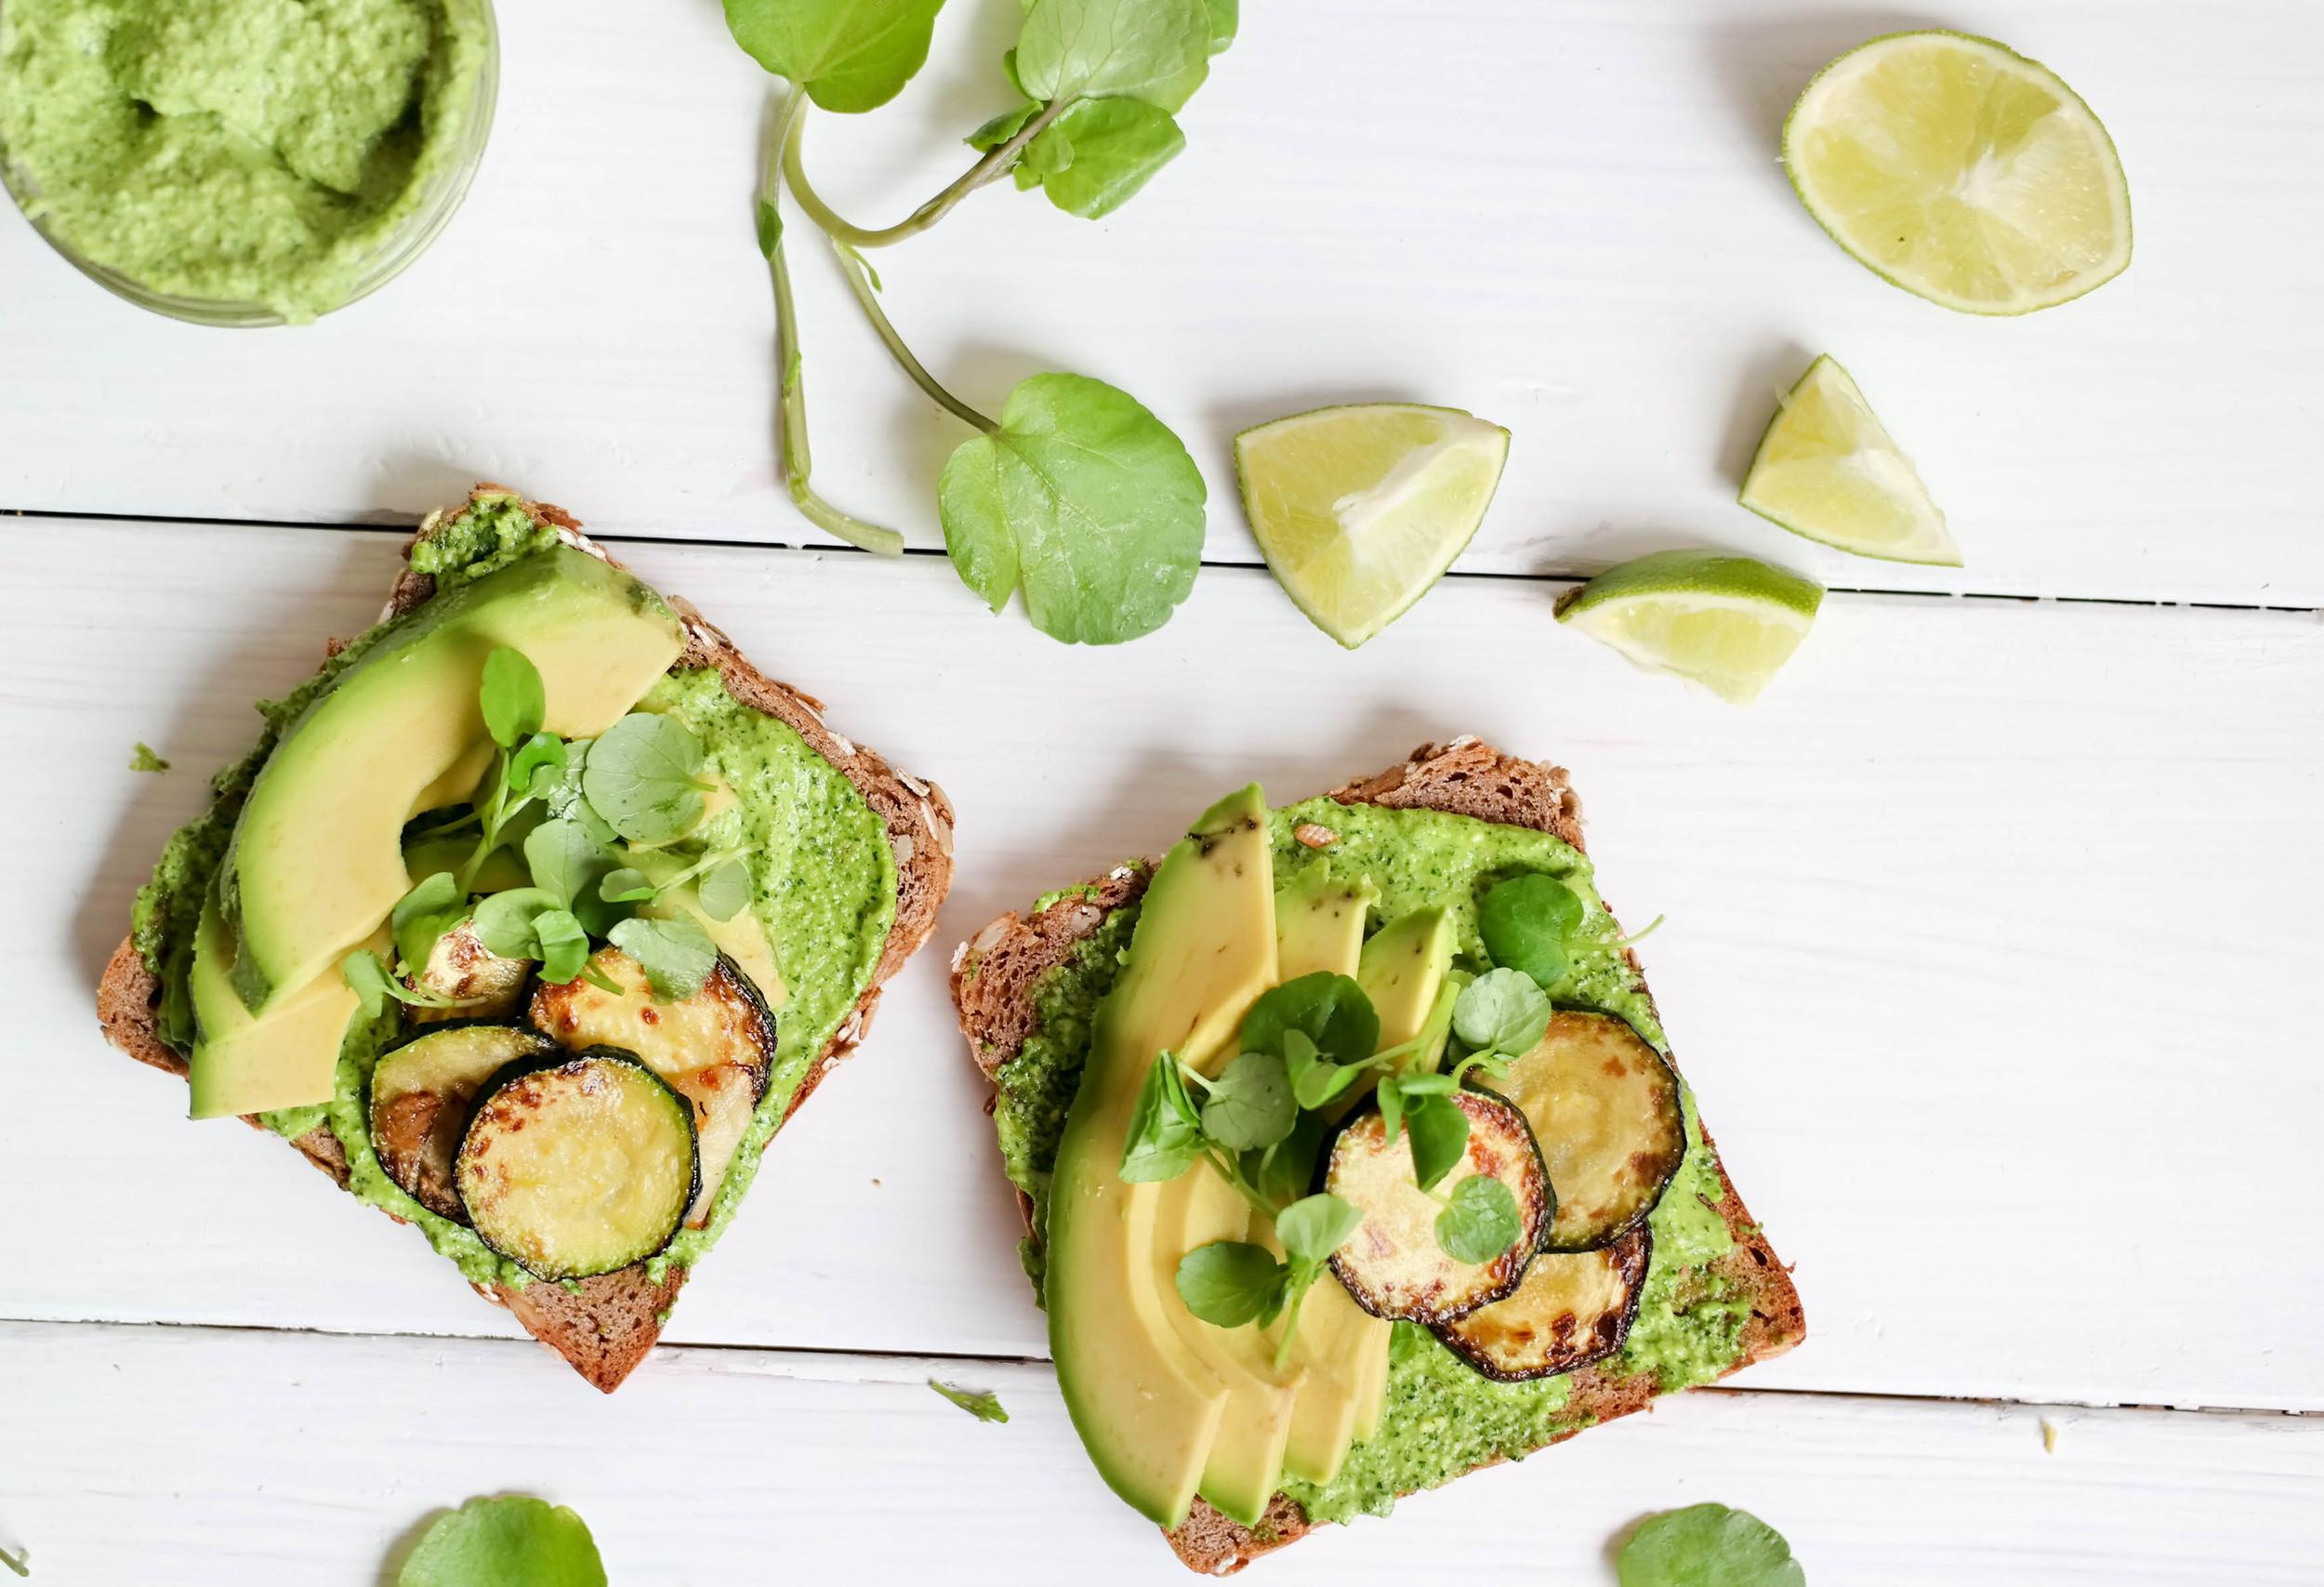 Arugula-Pesto-and-Zucchini Toast | www.8thandlake.com